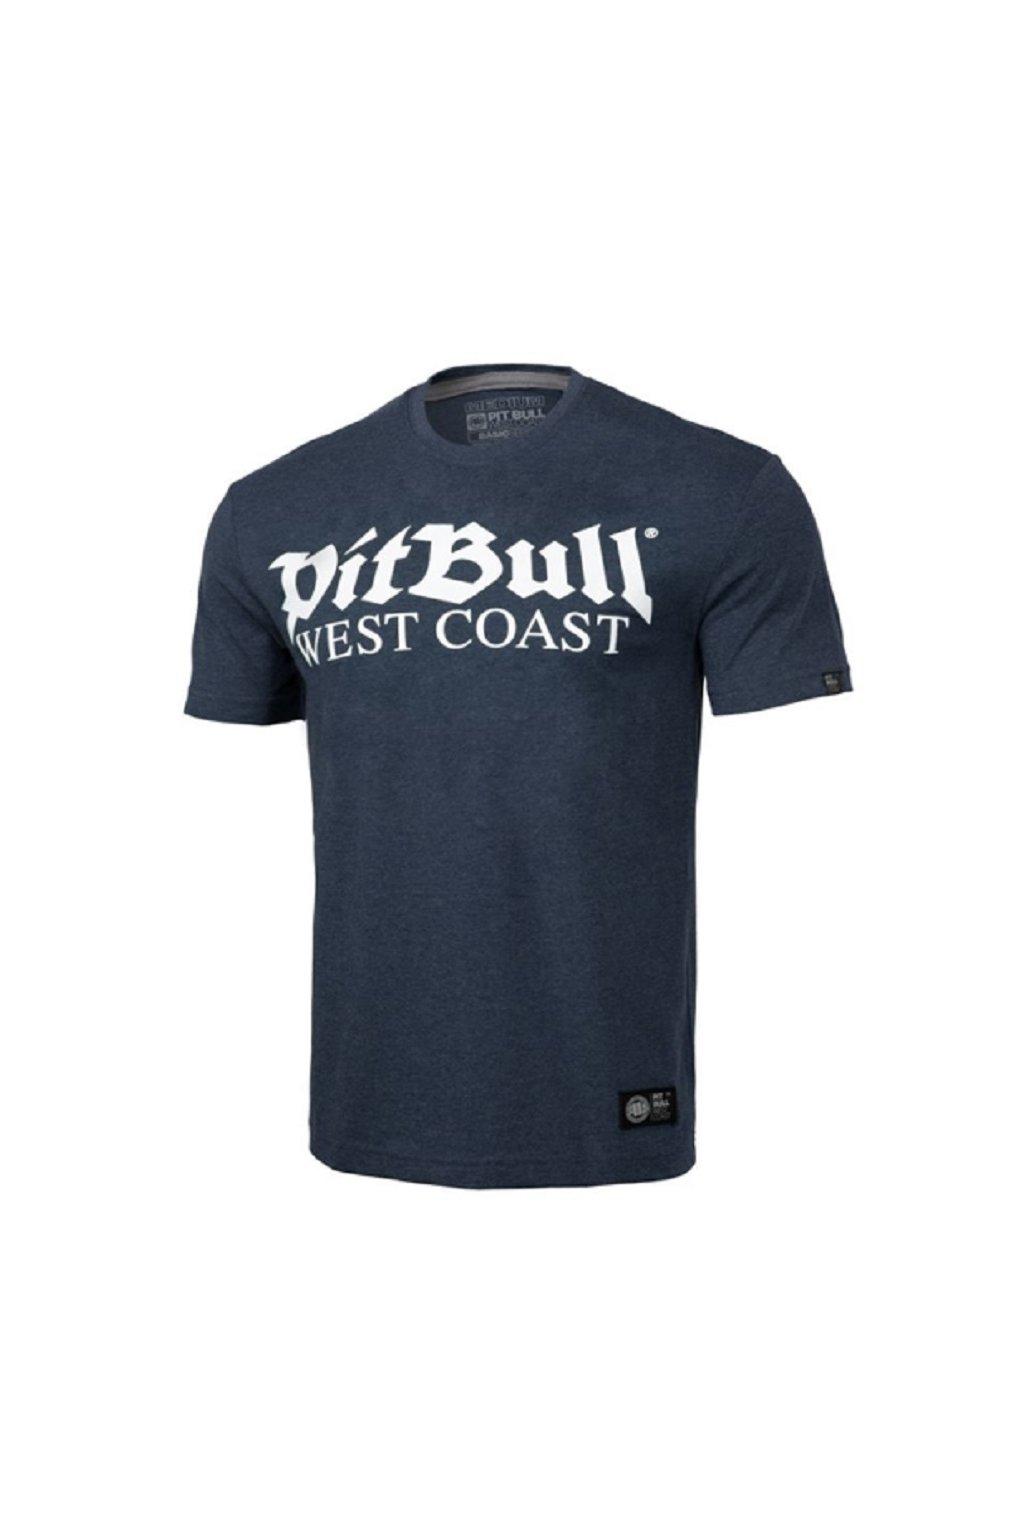 Pánské triko PIT BULL WEST COAST - OLD LOGO NAVY MELANGE obr1